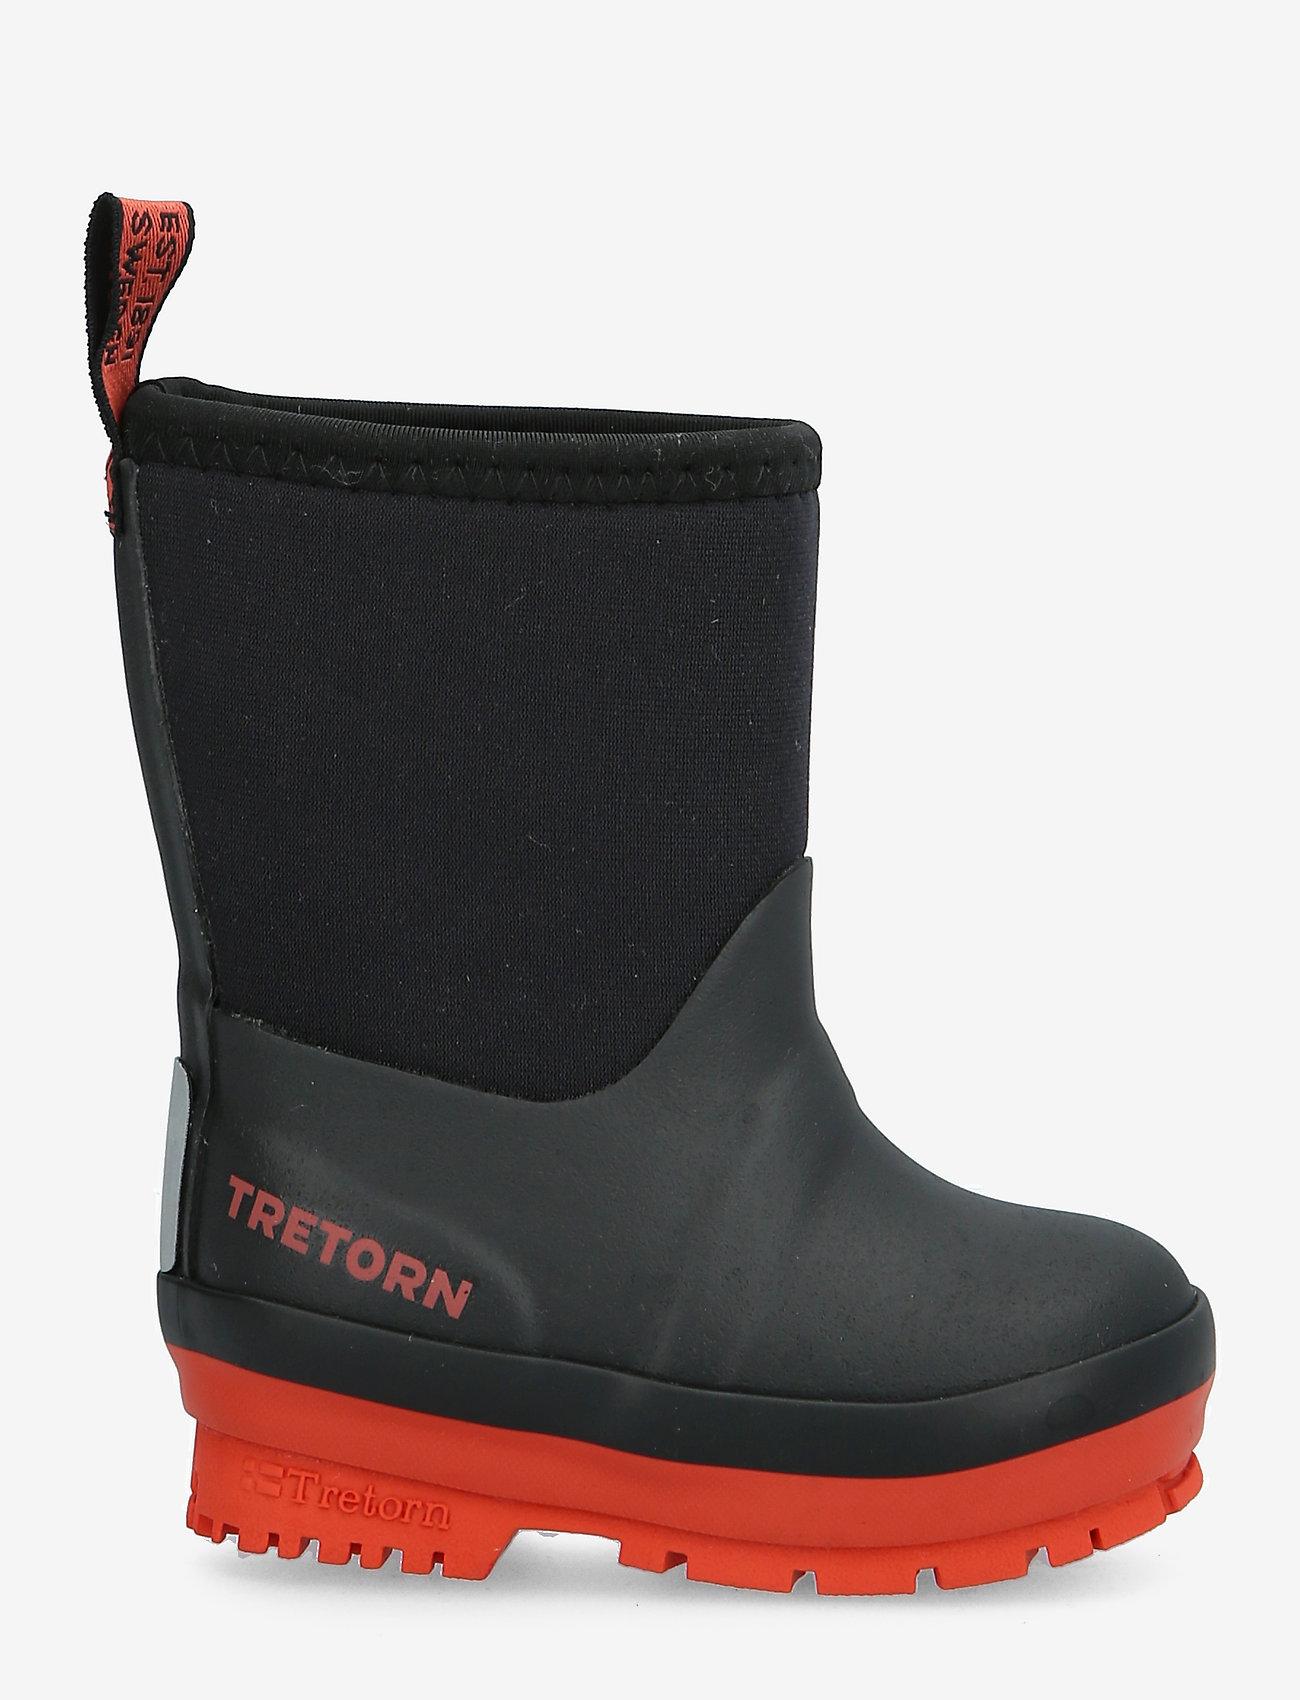 Tretorn - KULING NEOPRENE - vuorittomat kumisaappaat - 017/black/burnt - 1